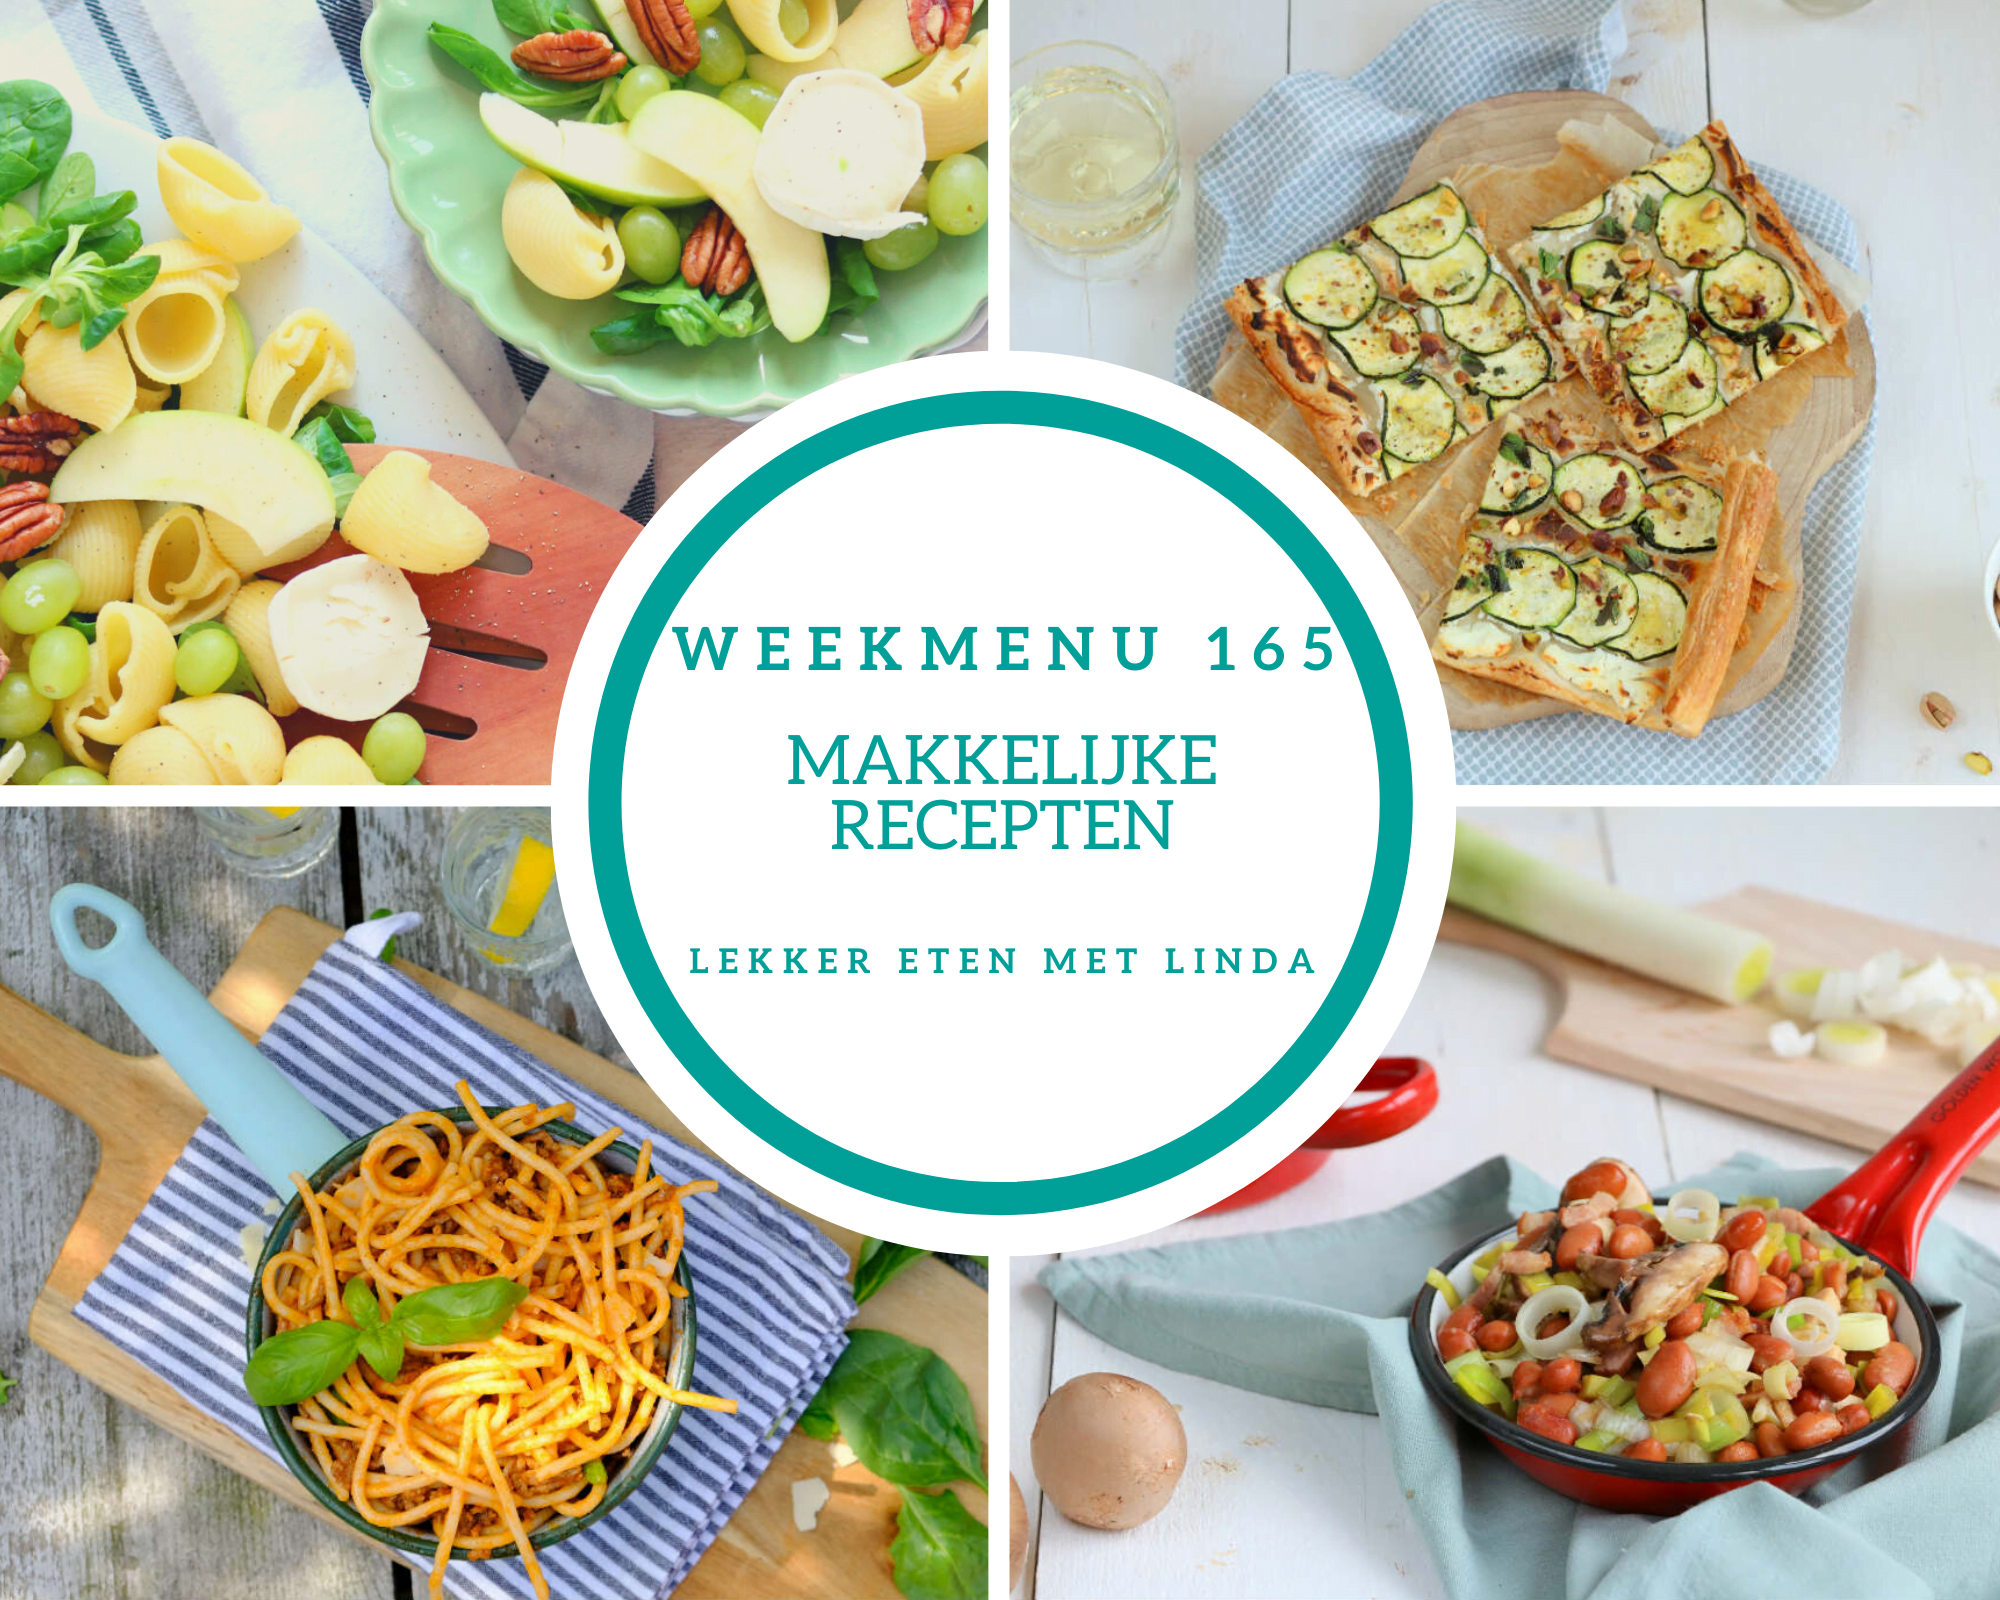 Weekmenu 165 makkelijke recepten